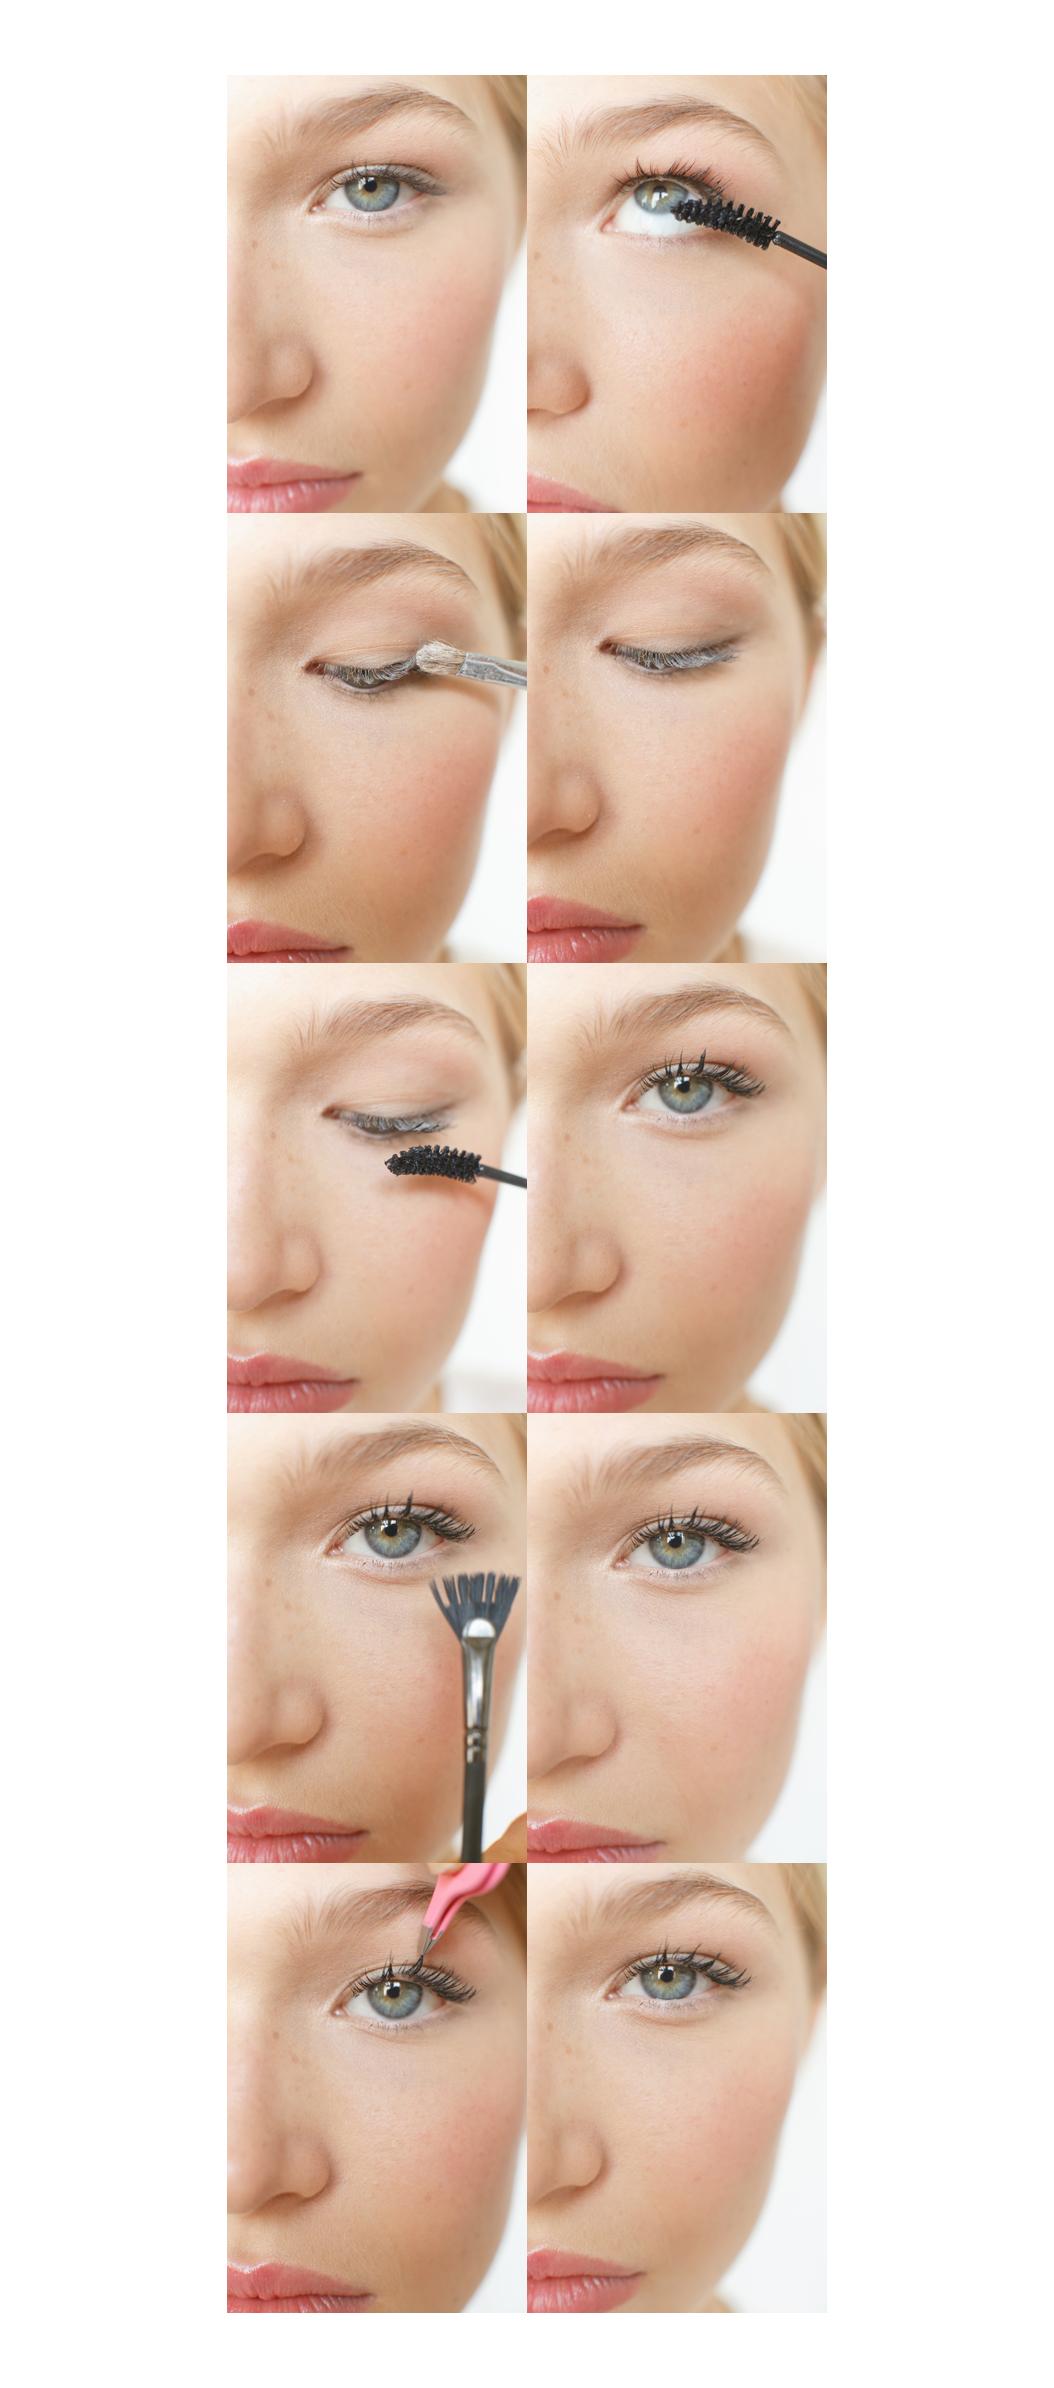 diy-fake-thicker-lashes-with-mascara-tutorial